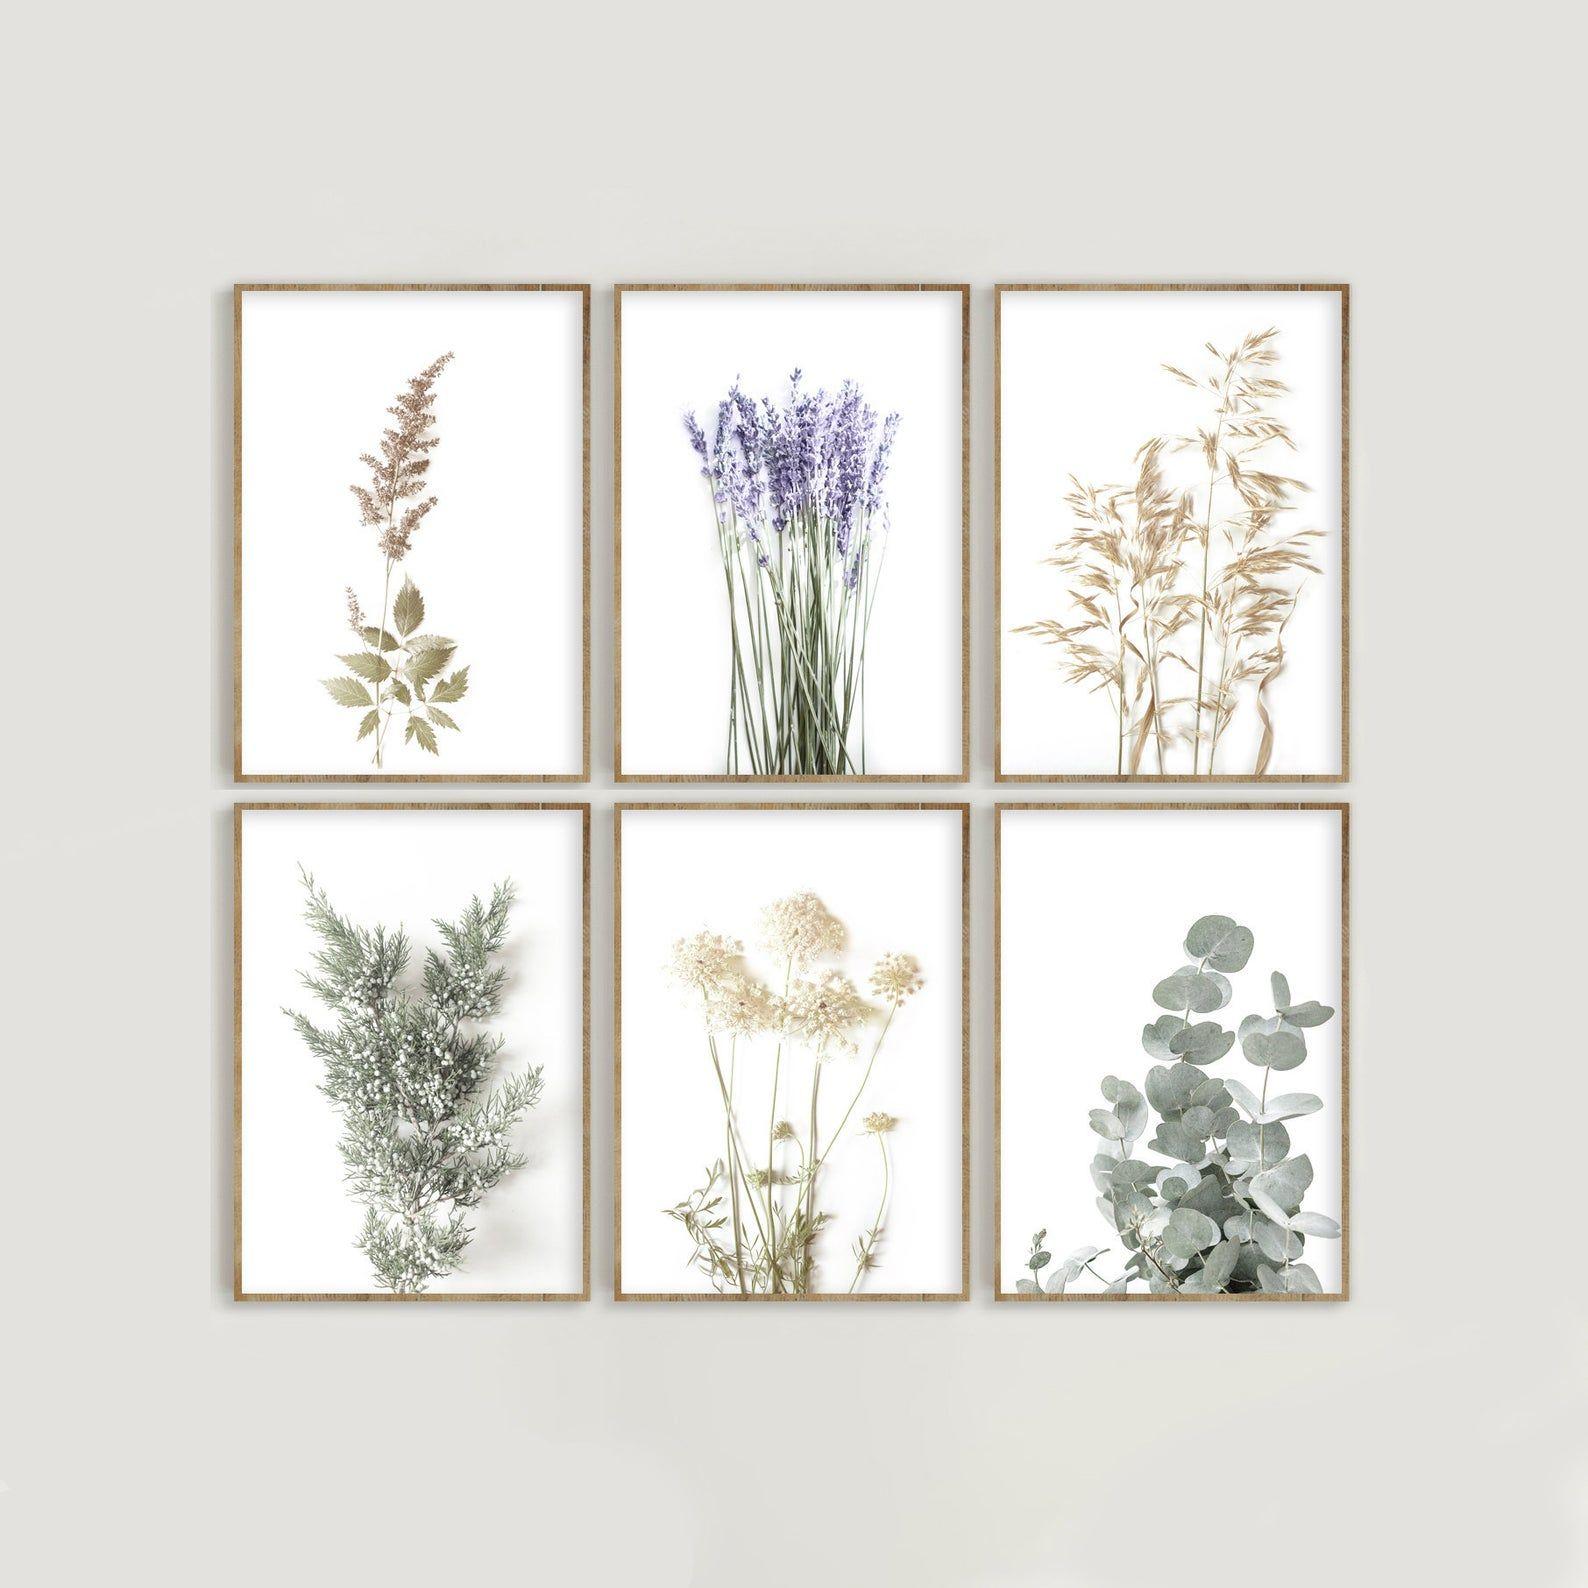 Botanical Print Set Of 6 Wild Flowers Prints Farmhouse Etsy Botanical Print Set Wall Decor Printables Framed Botanical Prints